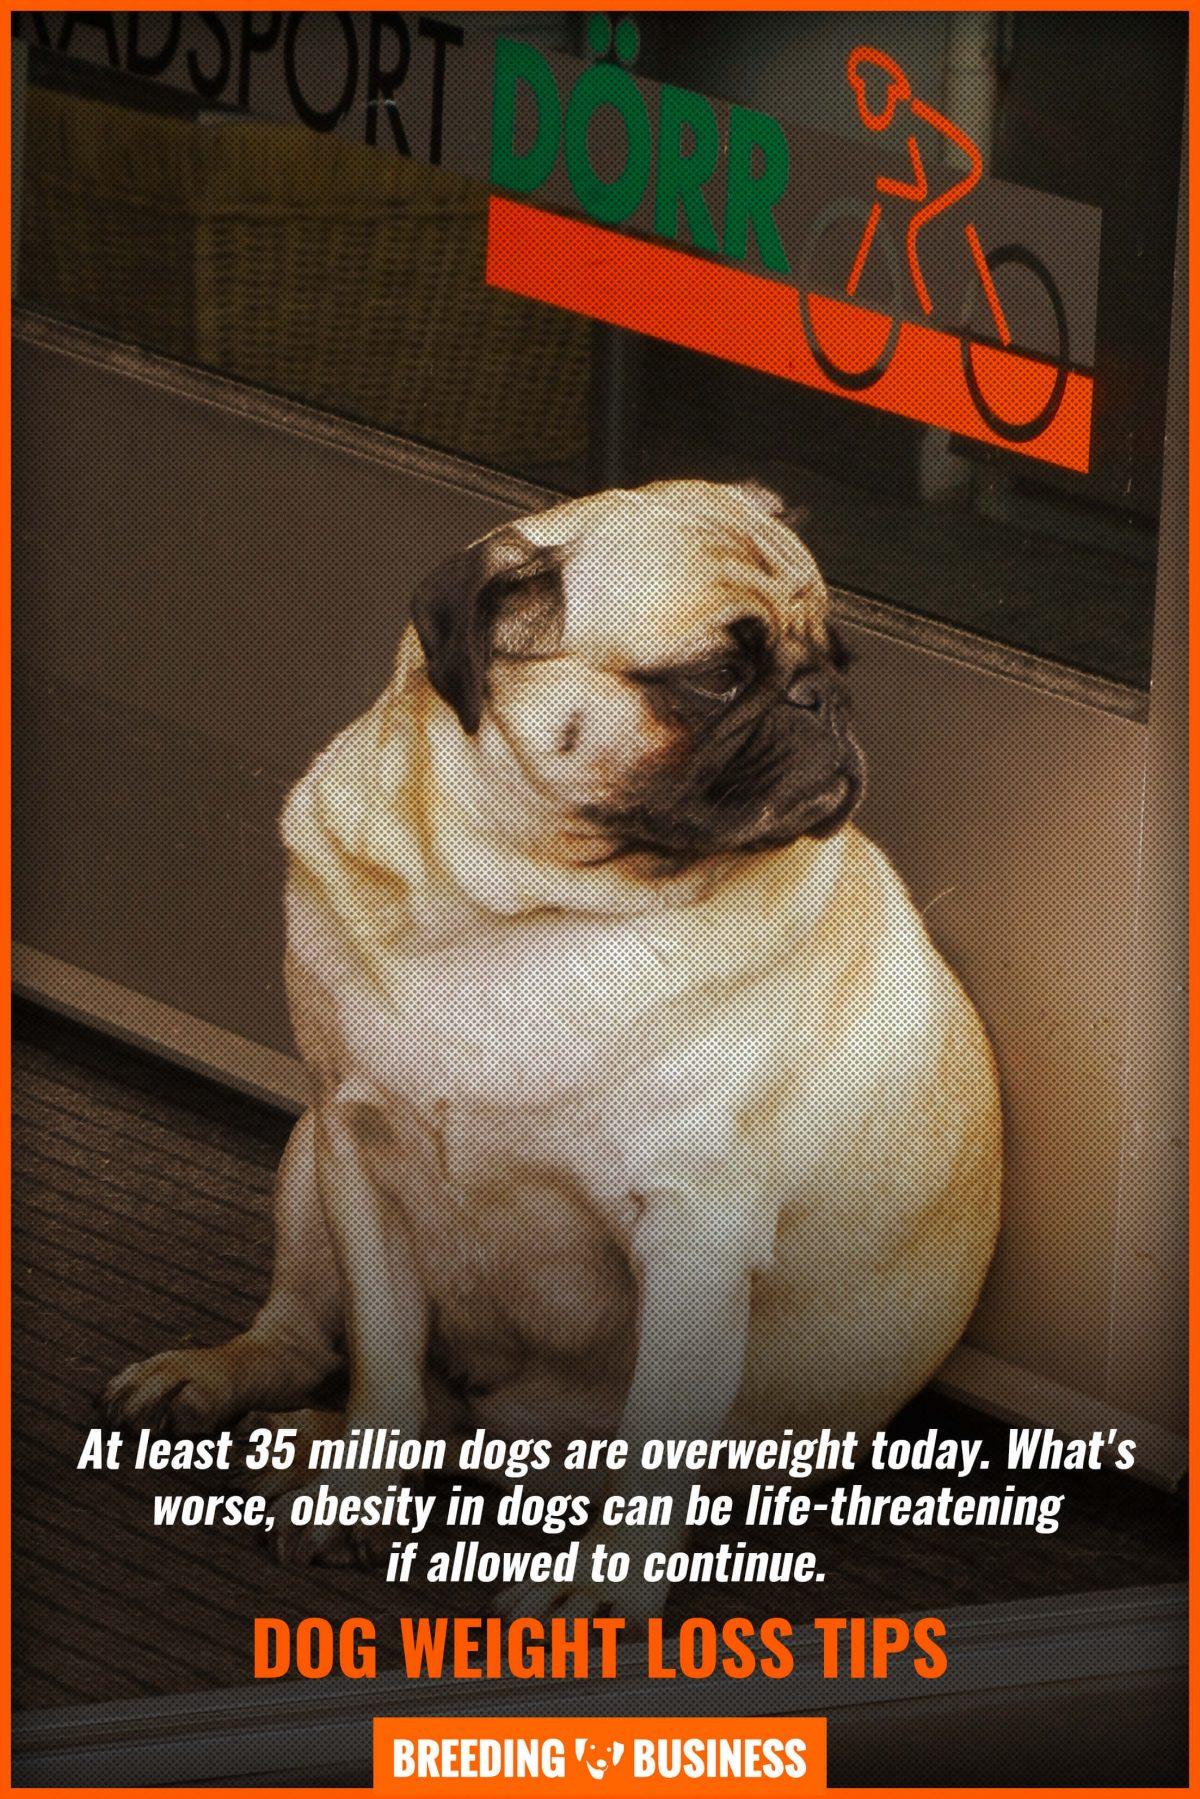 dog weight loss tips